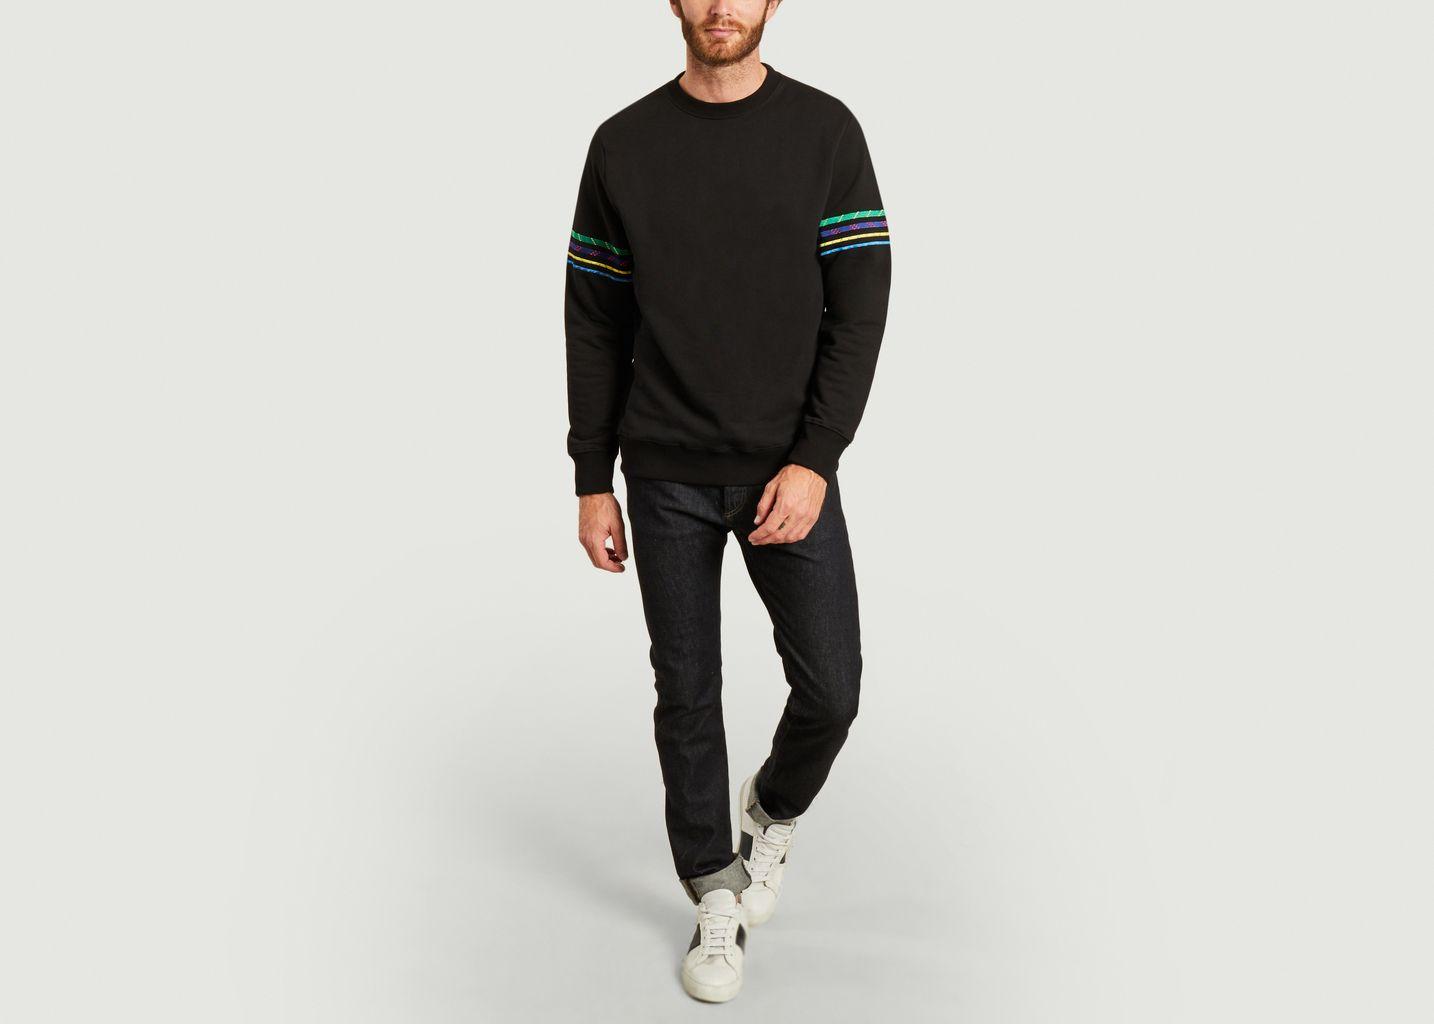 Sweatshirt en coton bio avec broderies - PS by PAUL SMITH